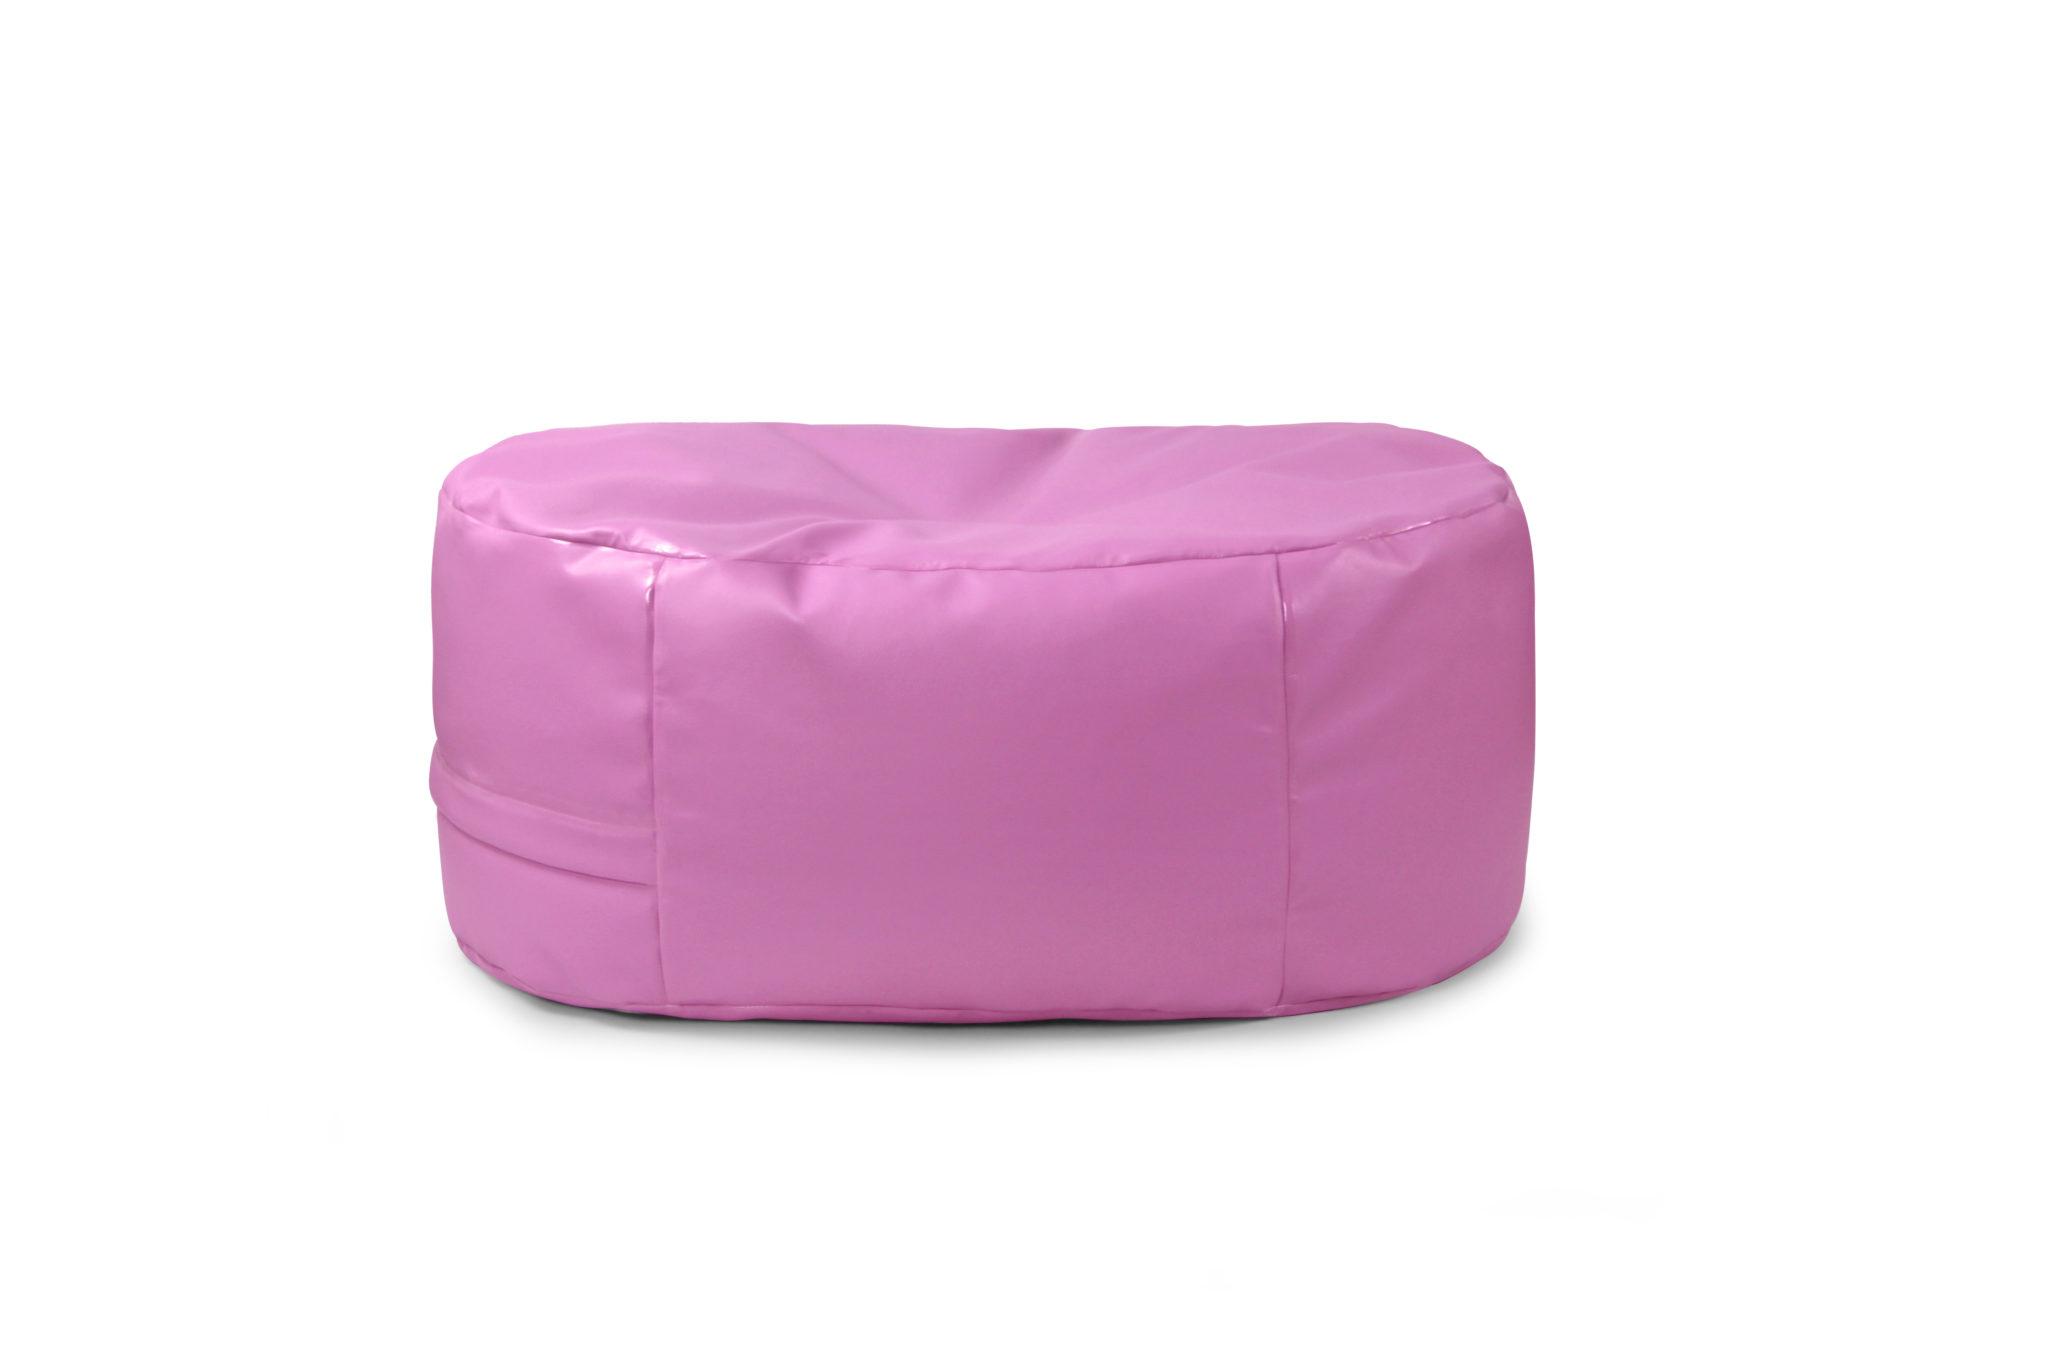 Sensory and Waterproof Bean Bags